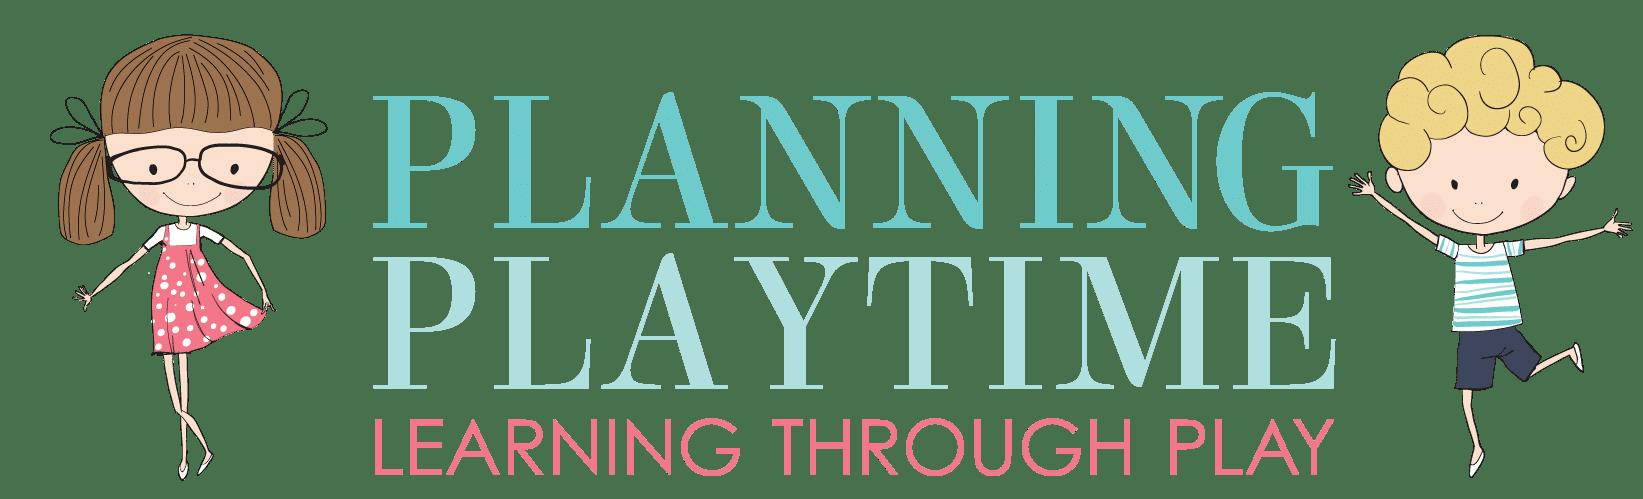 PLANNINGPLAYTIME-logo